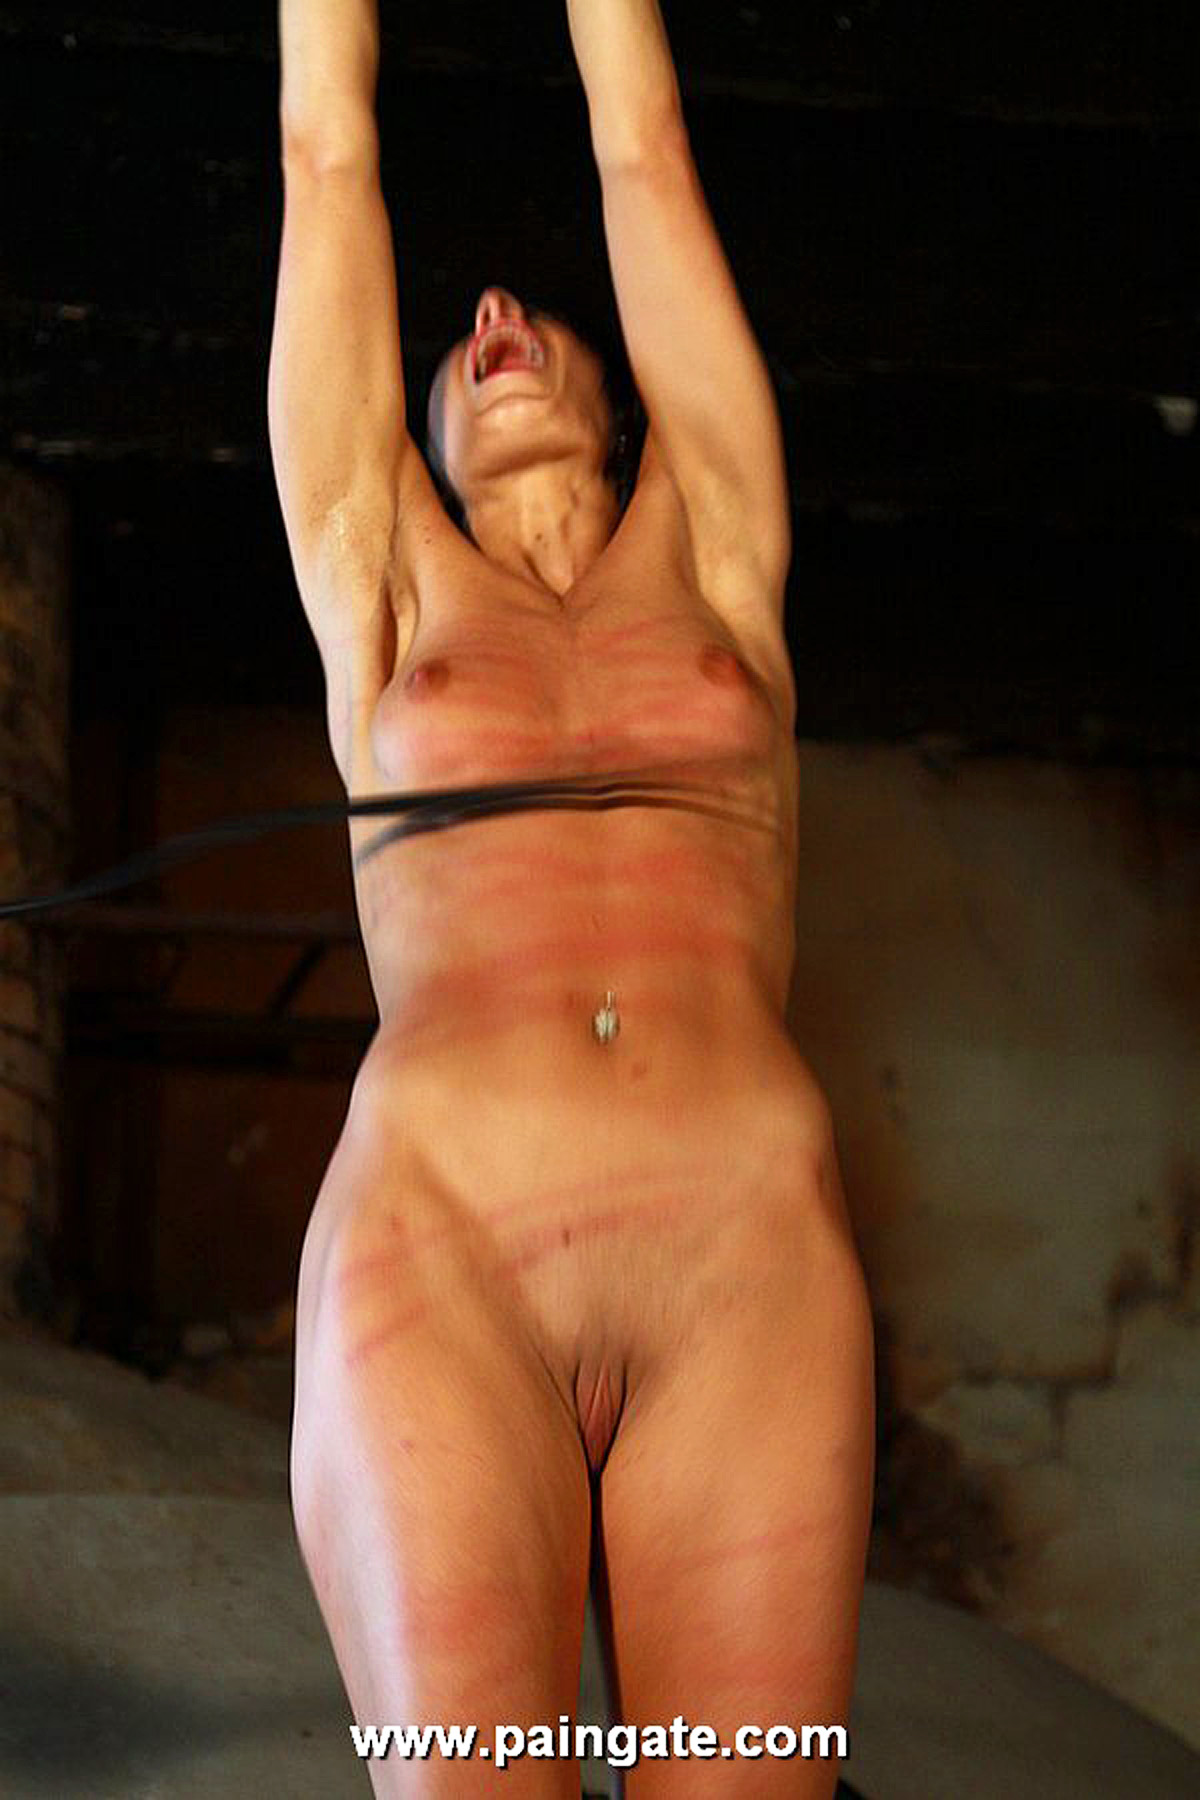 Adult dildo sex toy